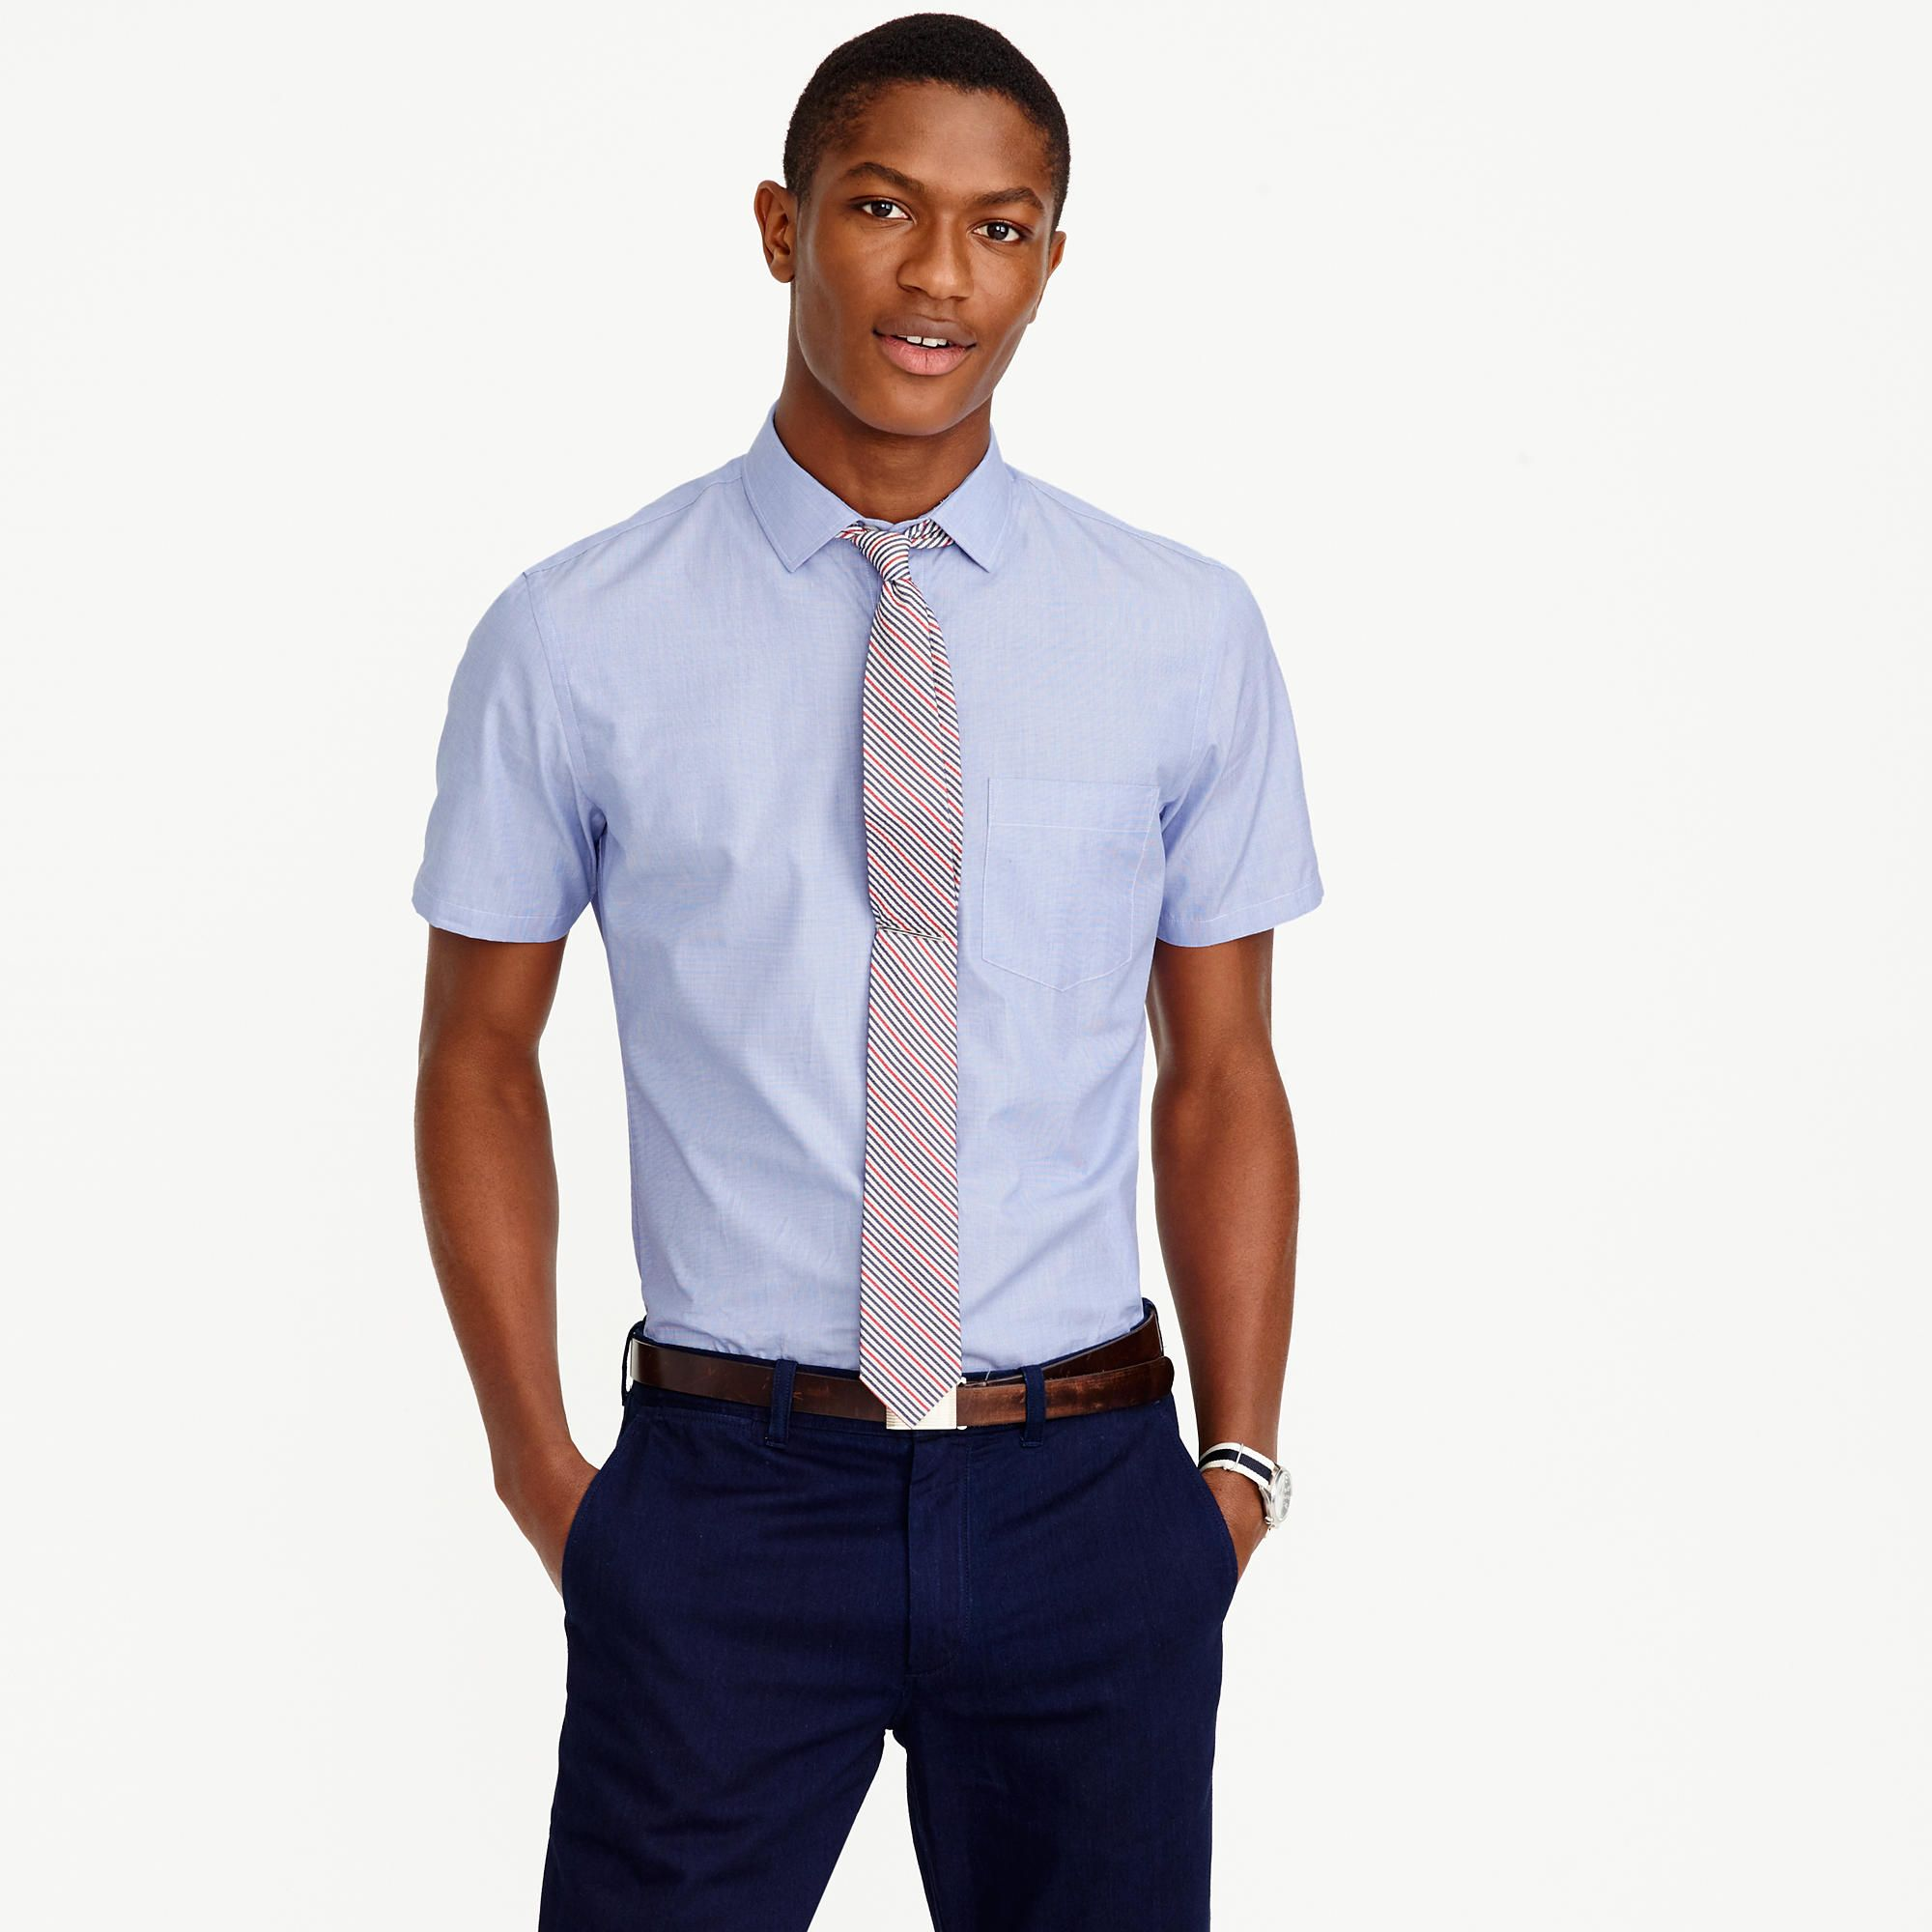 Short Sleeve Dress Shirt Skinny Tie Bcd Tofu House